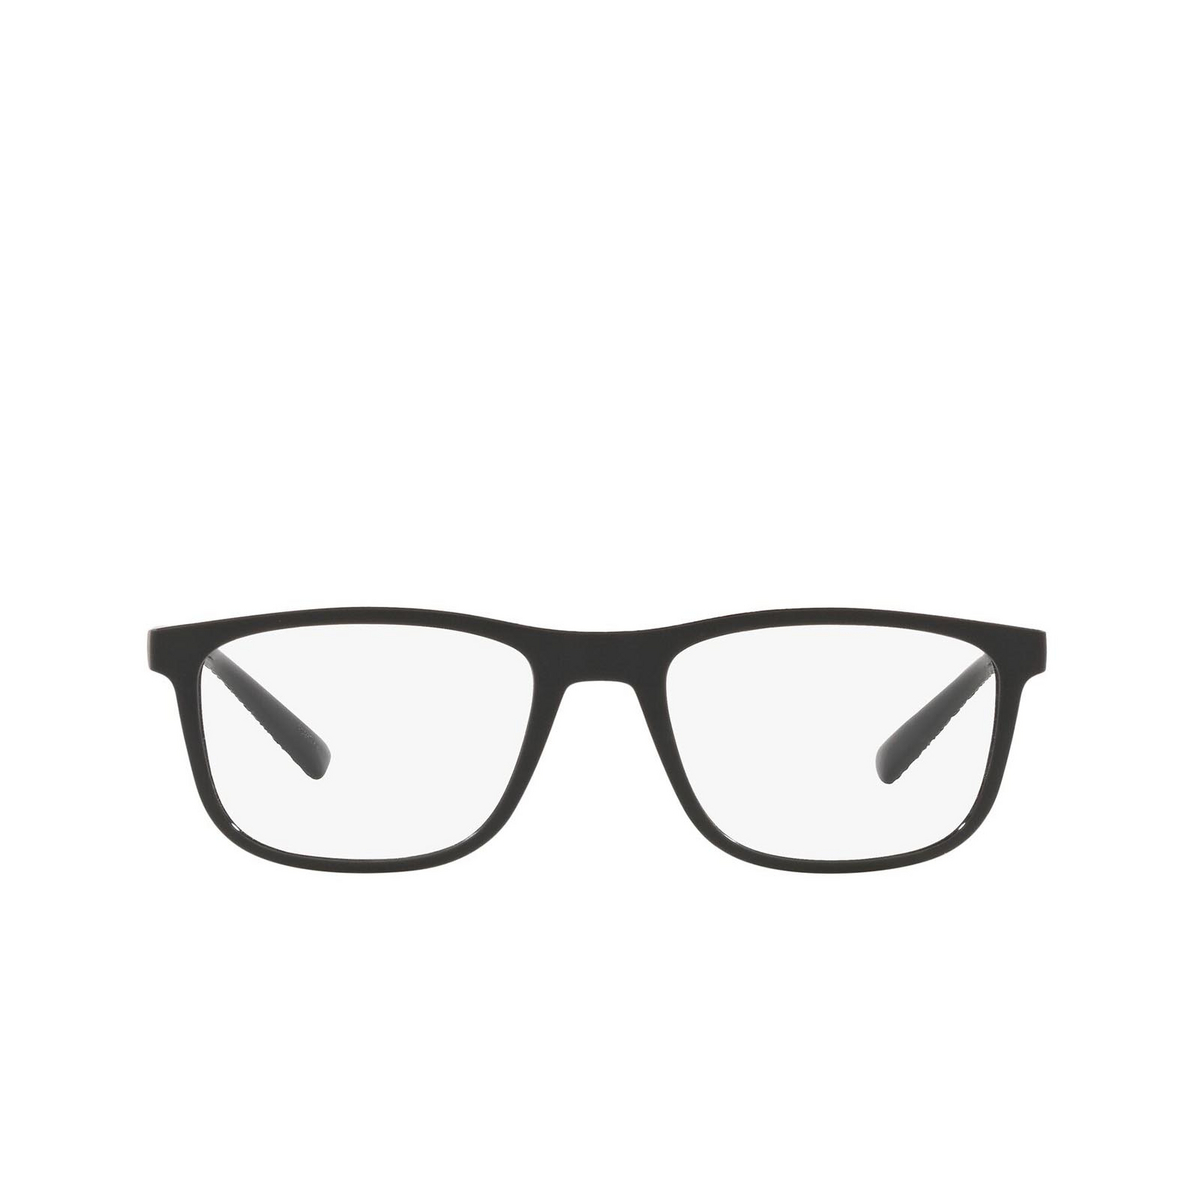 Dolce & Gabbana® Rectangle Eyeglasses: DG5062 color Black 2525 - front view.